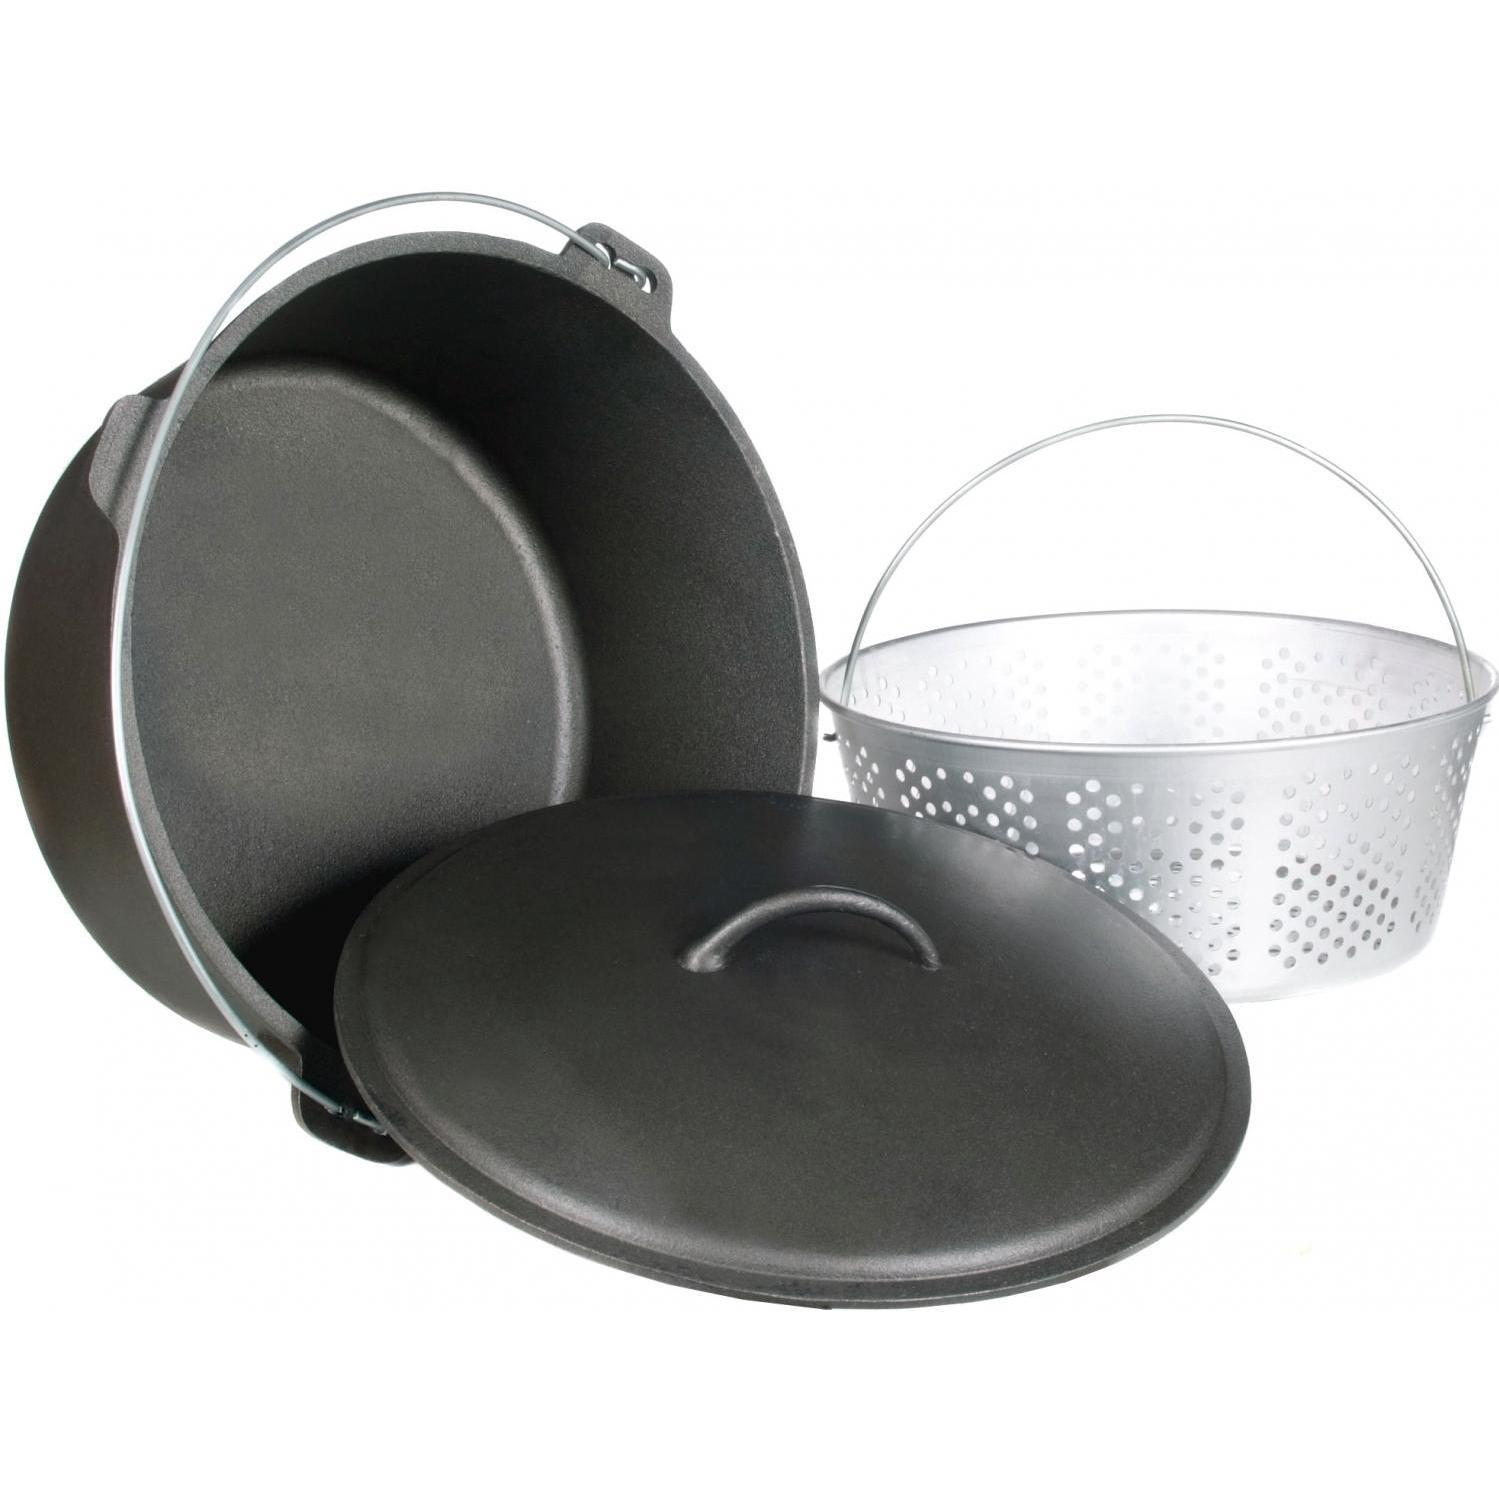 Cajun Cookware Dutch Ovens With Fry Basket 20 Quart Cast Iron Dutch Oven